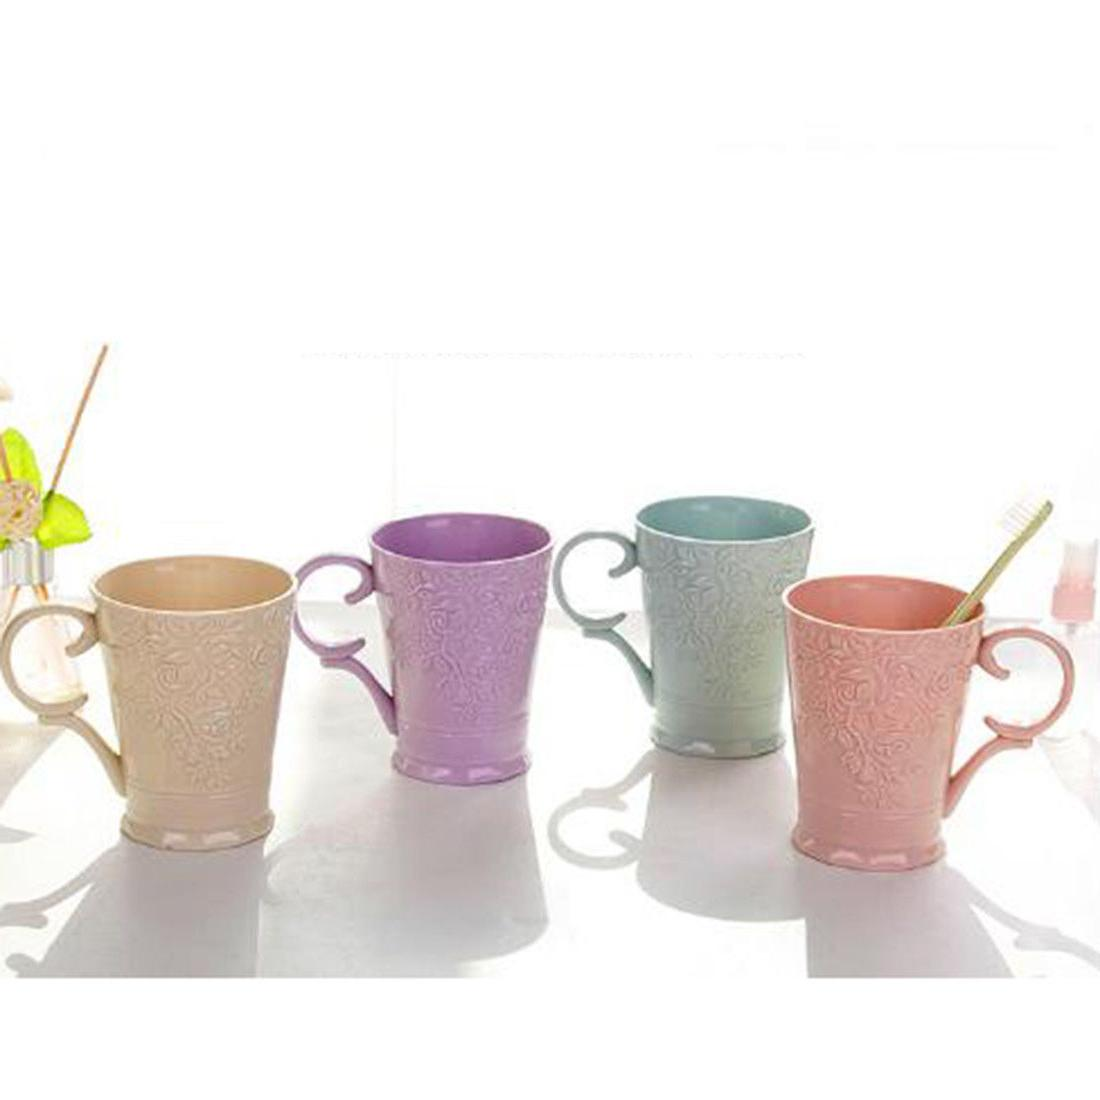 400ml Creative Nice Solid color Coffee Mug Plastic Cup Gift